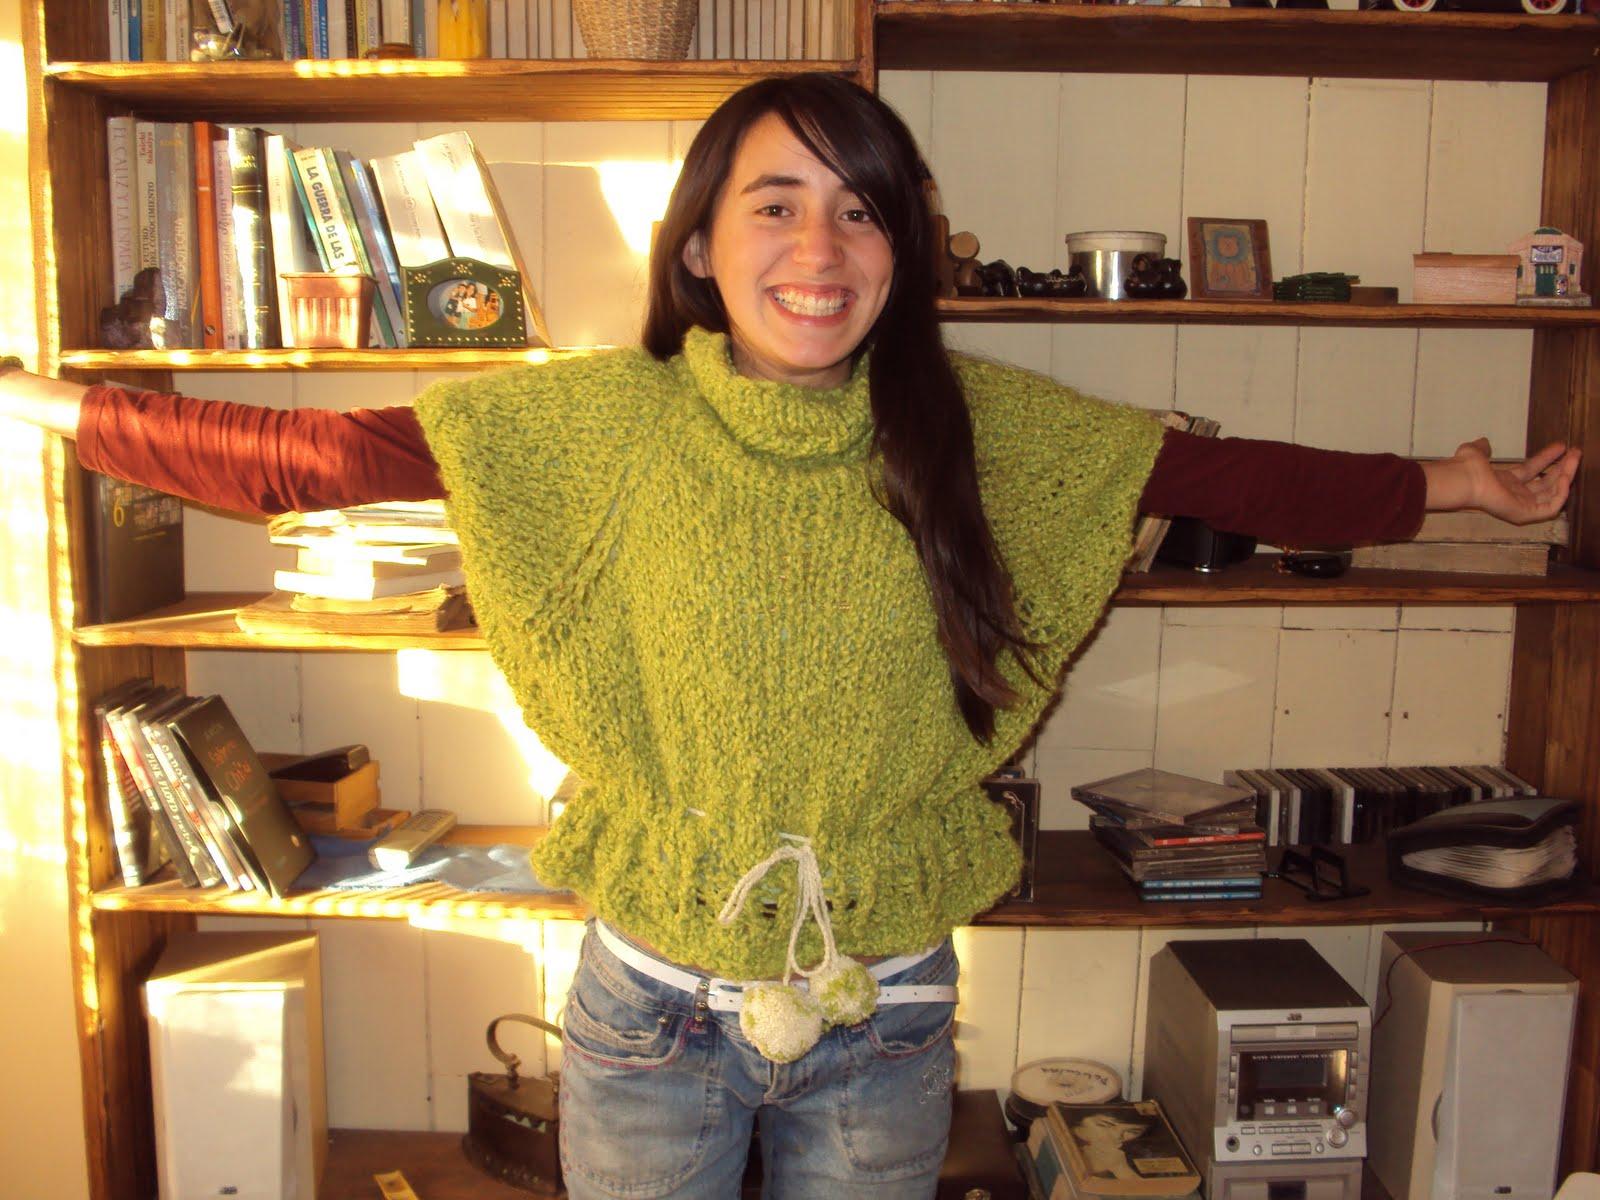 Muebles Tomas Irribarra - Patricia Moreno Tejidos[mjhdah]https://http2.mlstatic.com/tinas-calientes-de-maderas-hot-tub-para-6-personas-D_NQ_NP_15634-MLC20106890269_062014-F.jpg